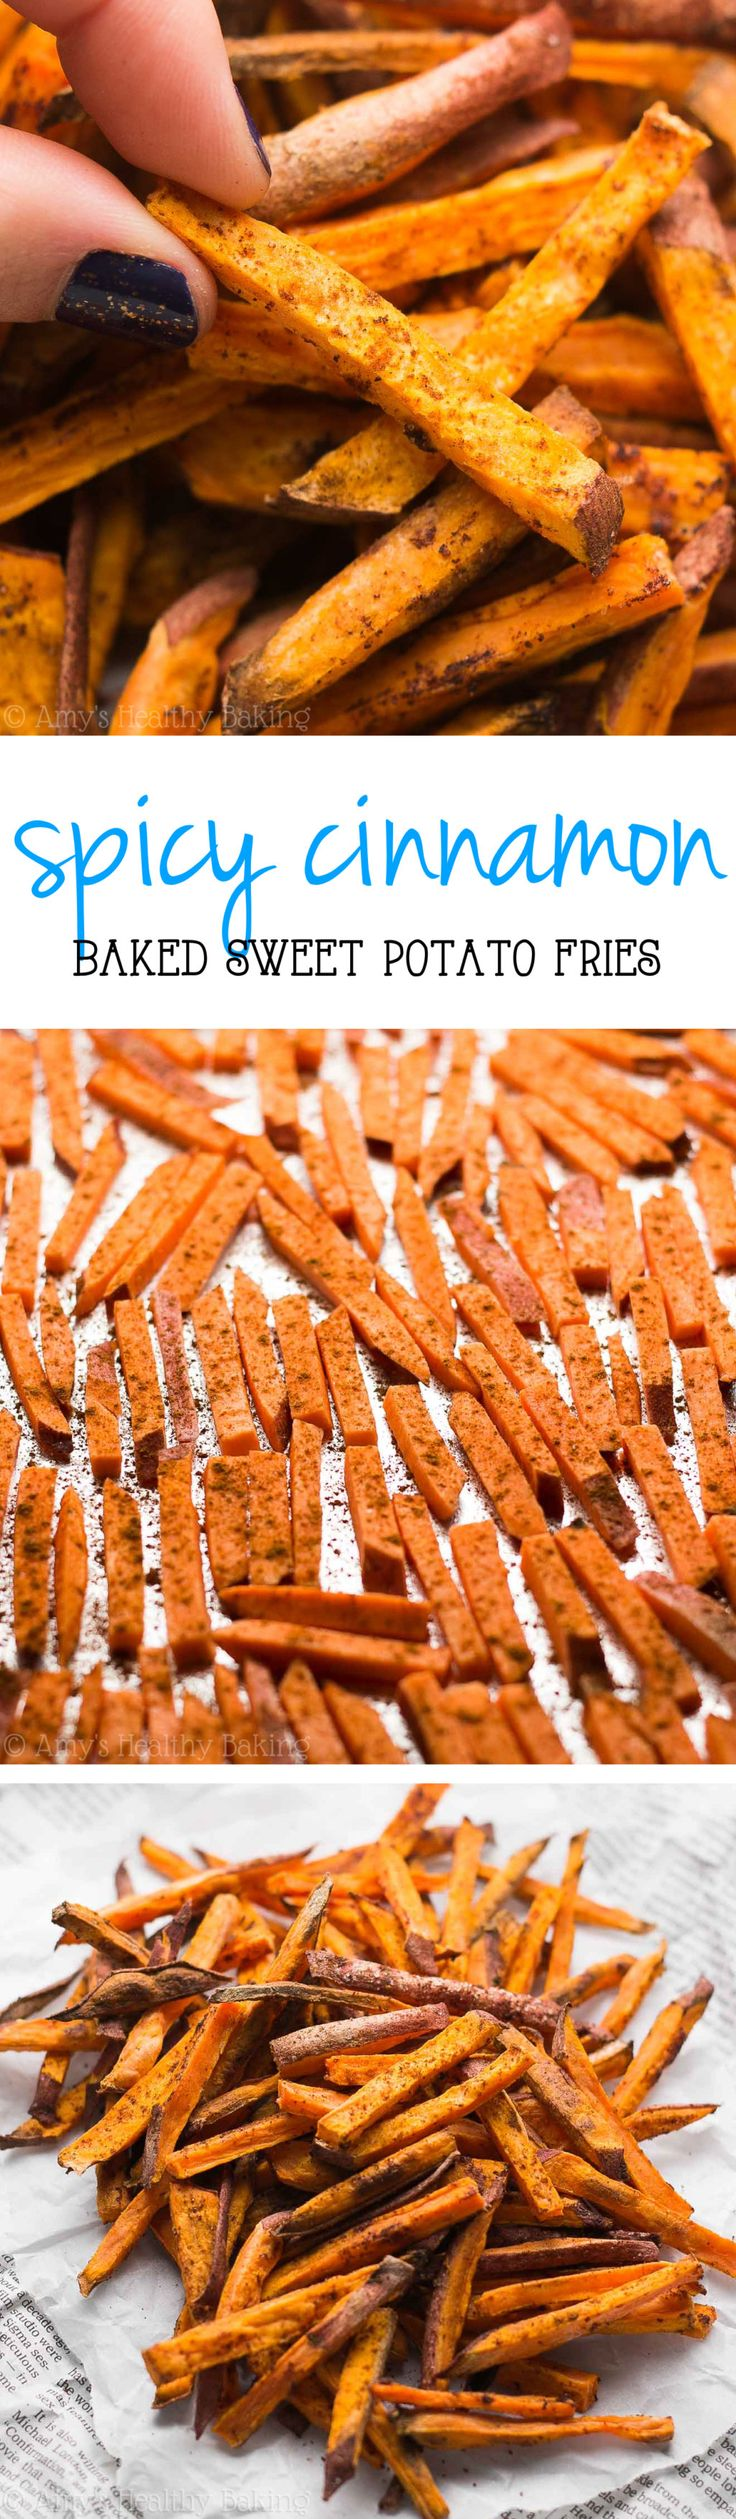 Paleo Baked Spicy Cinnamon Sweet Potato Fries Recipe